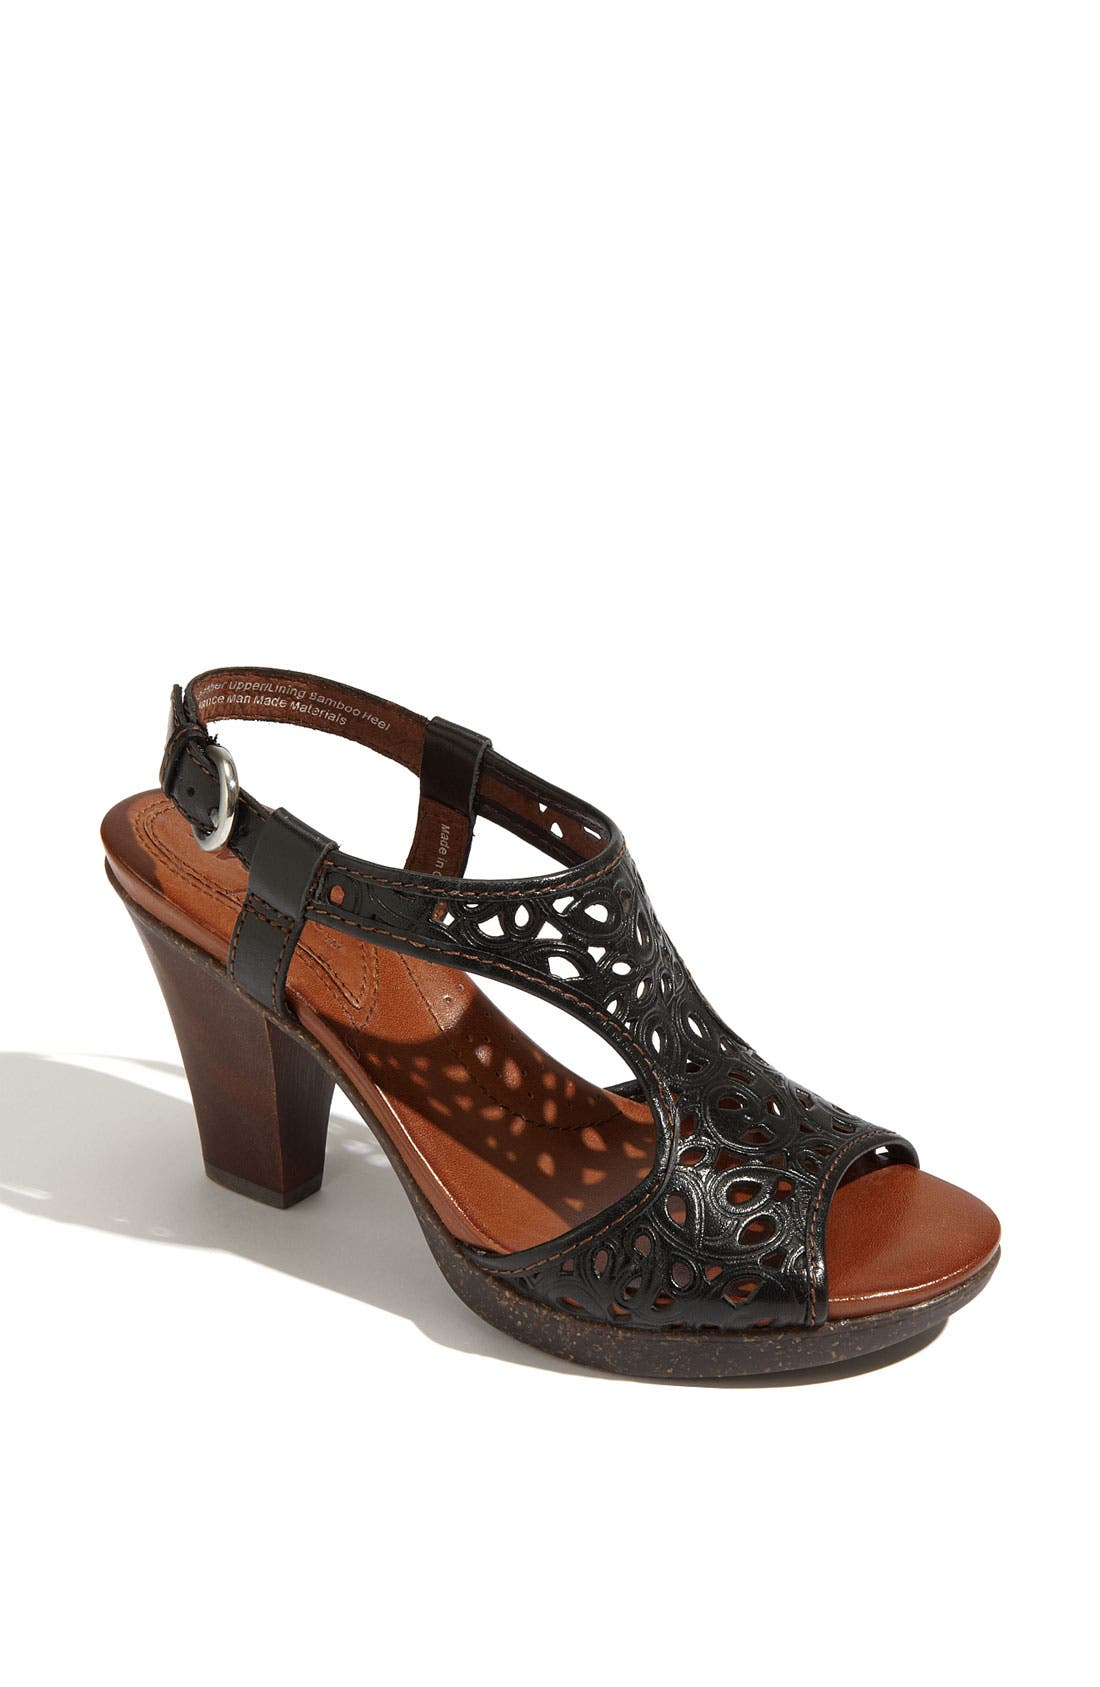 Alternate Image 1 Selected - Naya 'Alpine' Sandal